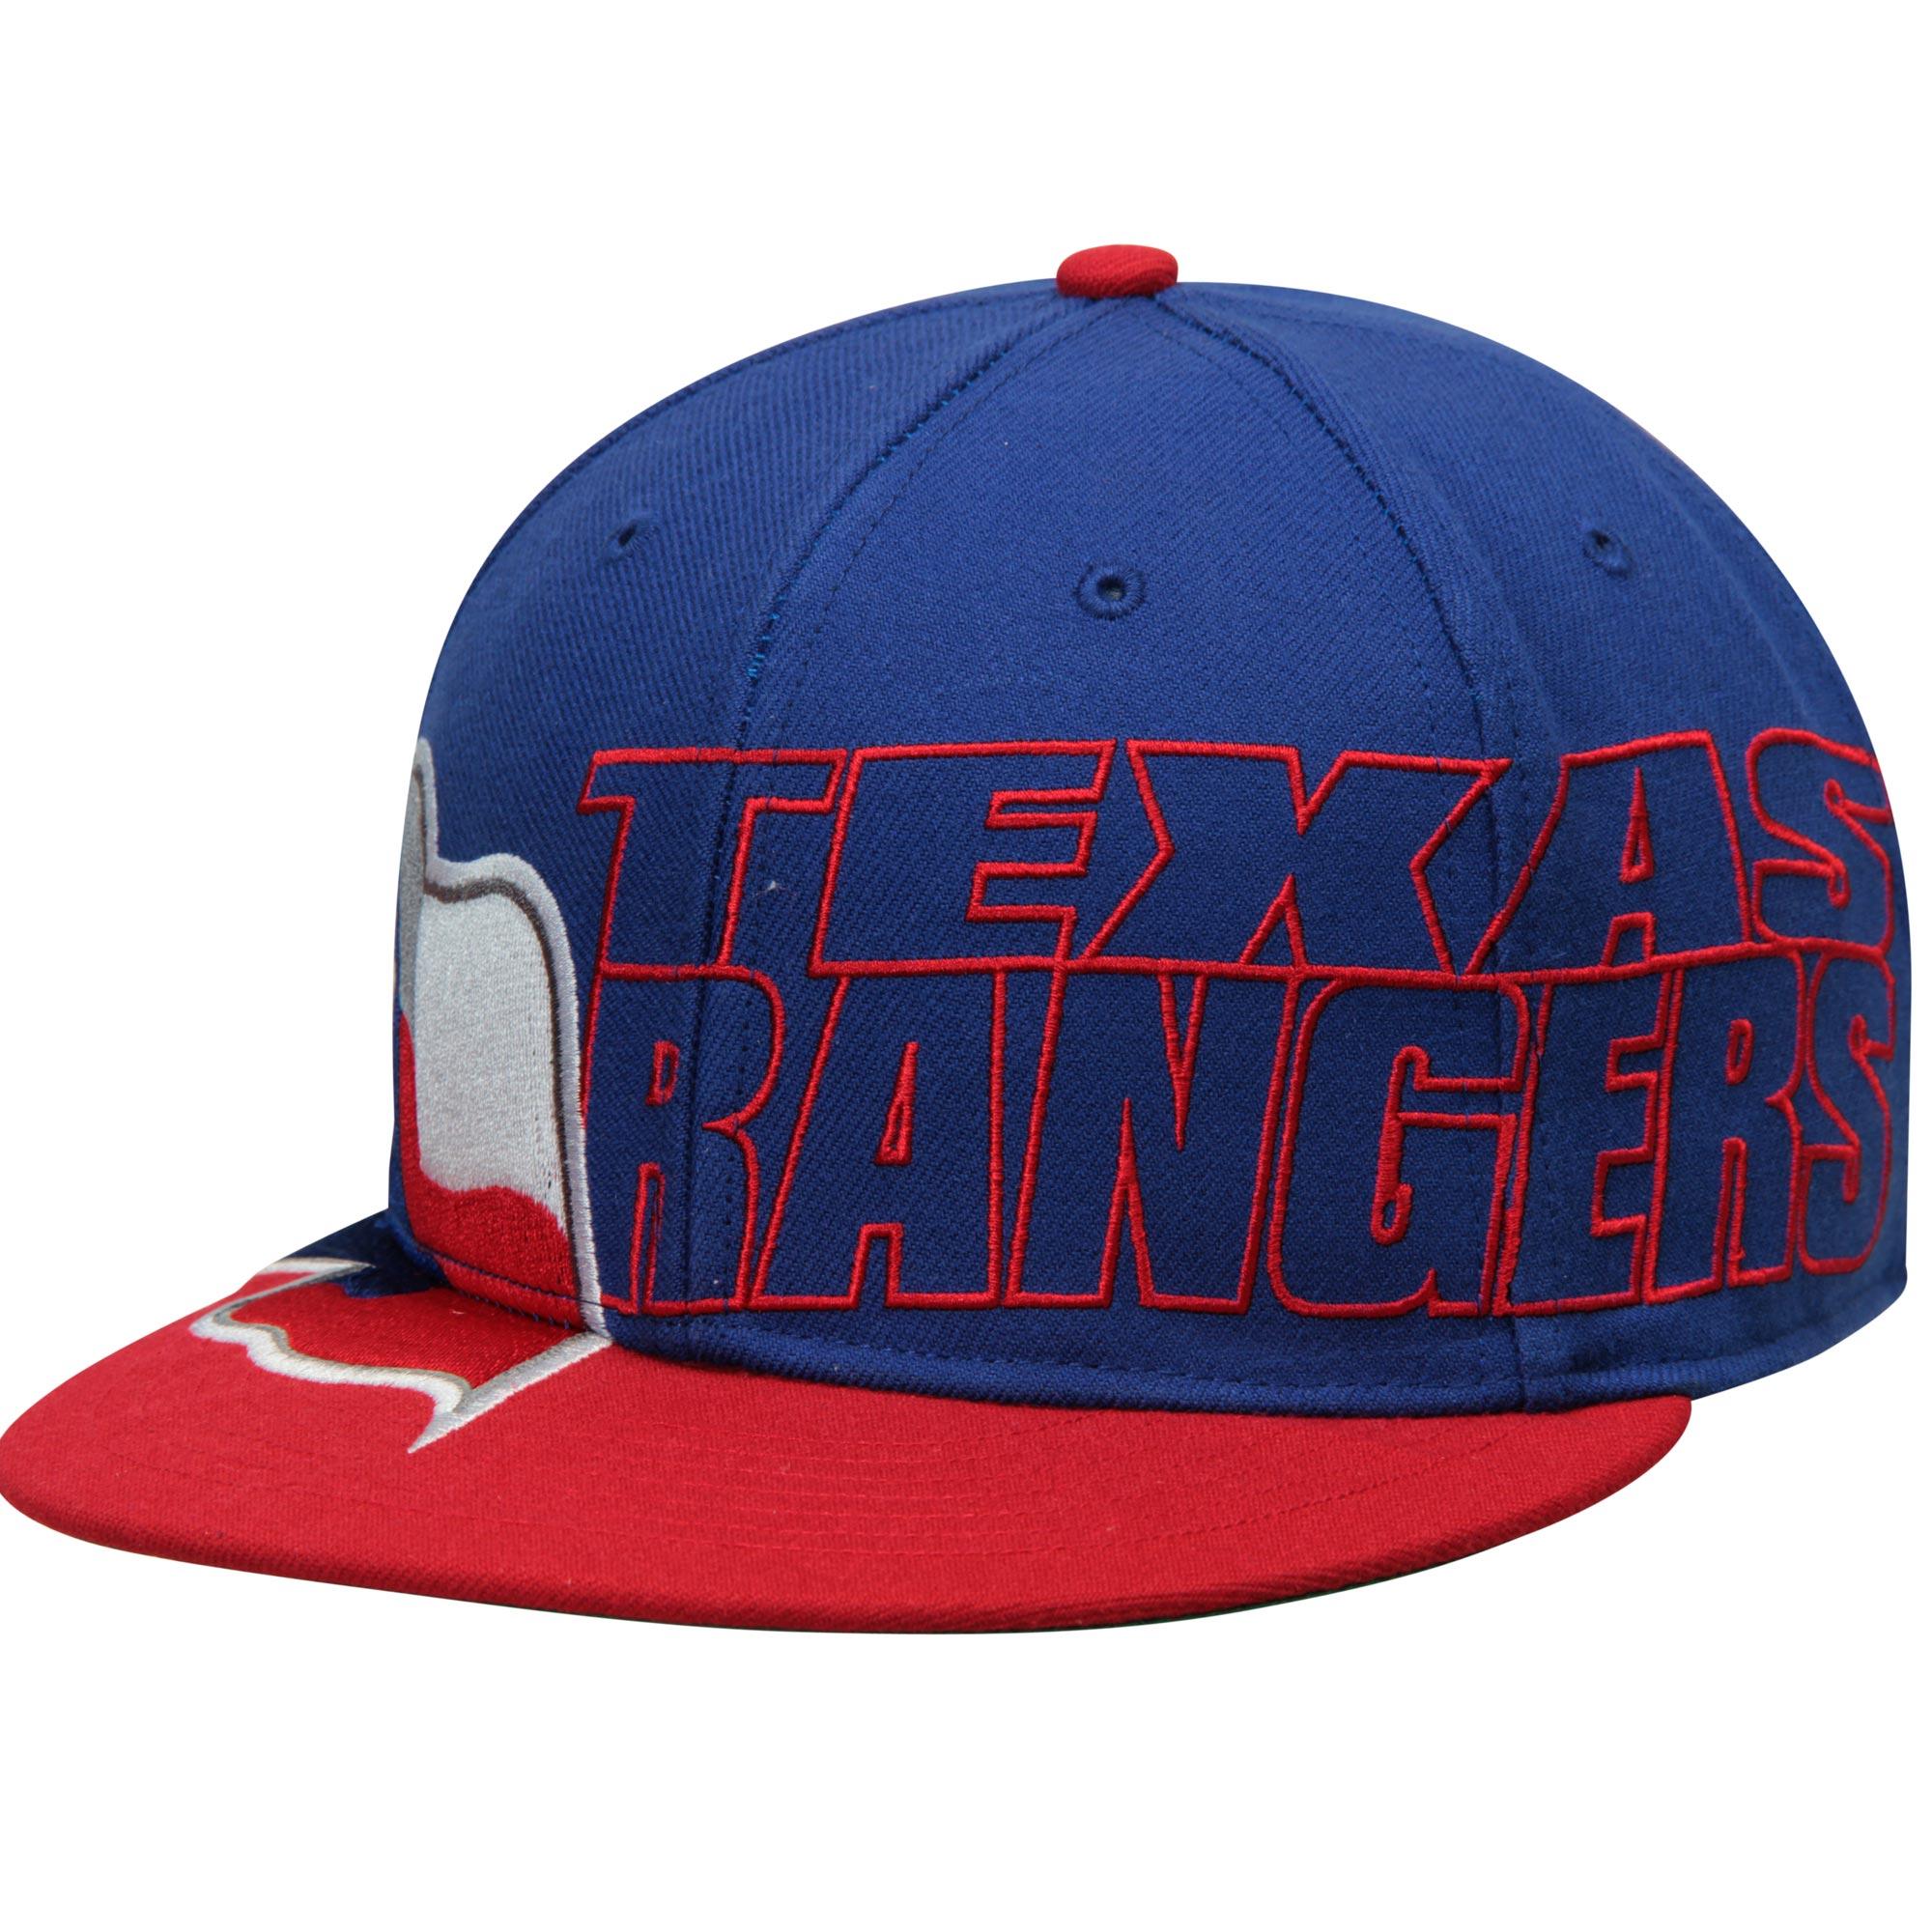 Texas Rangers '47 Big Rush Adjustable Hat - Royal/Red - OSFA